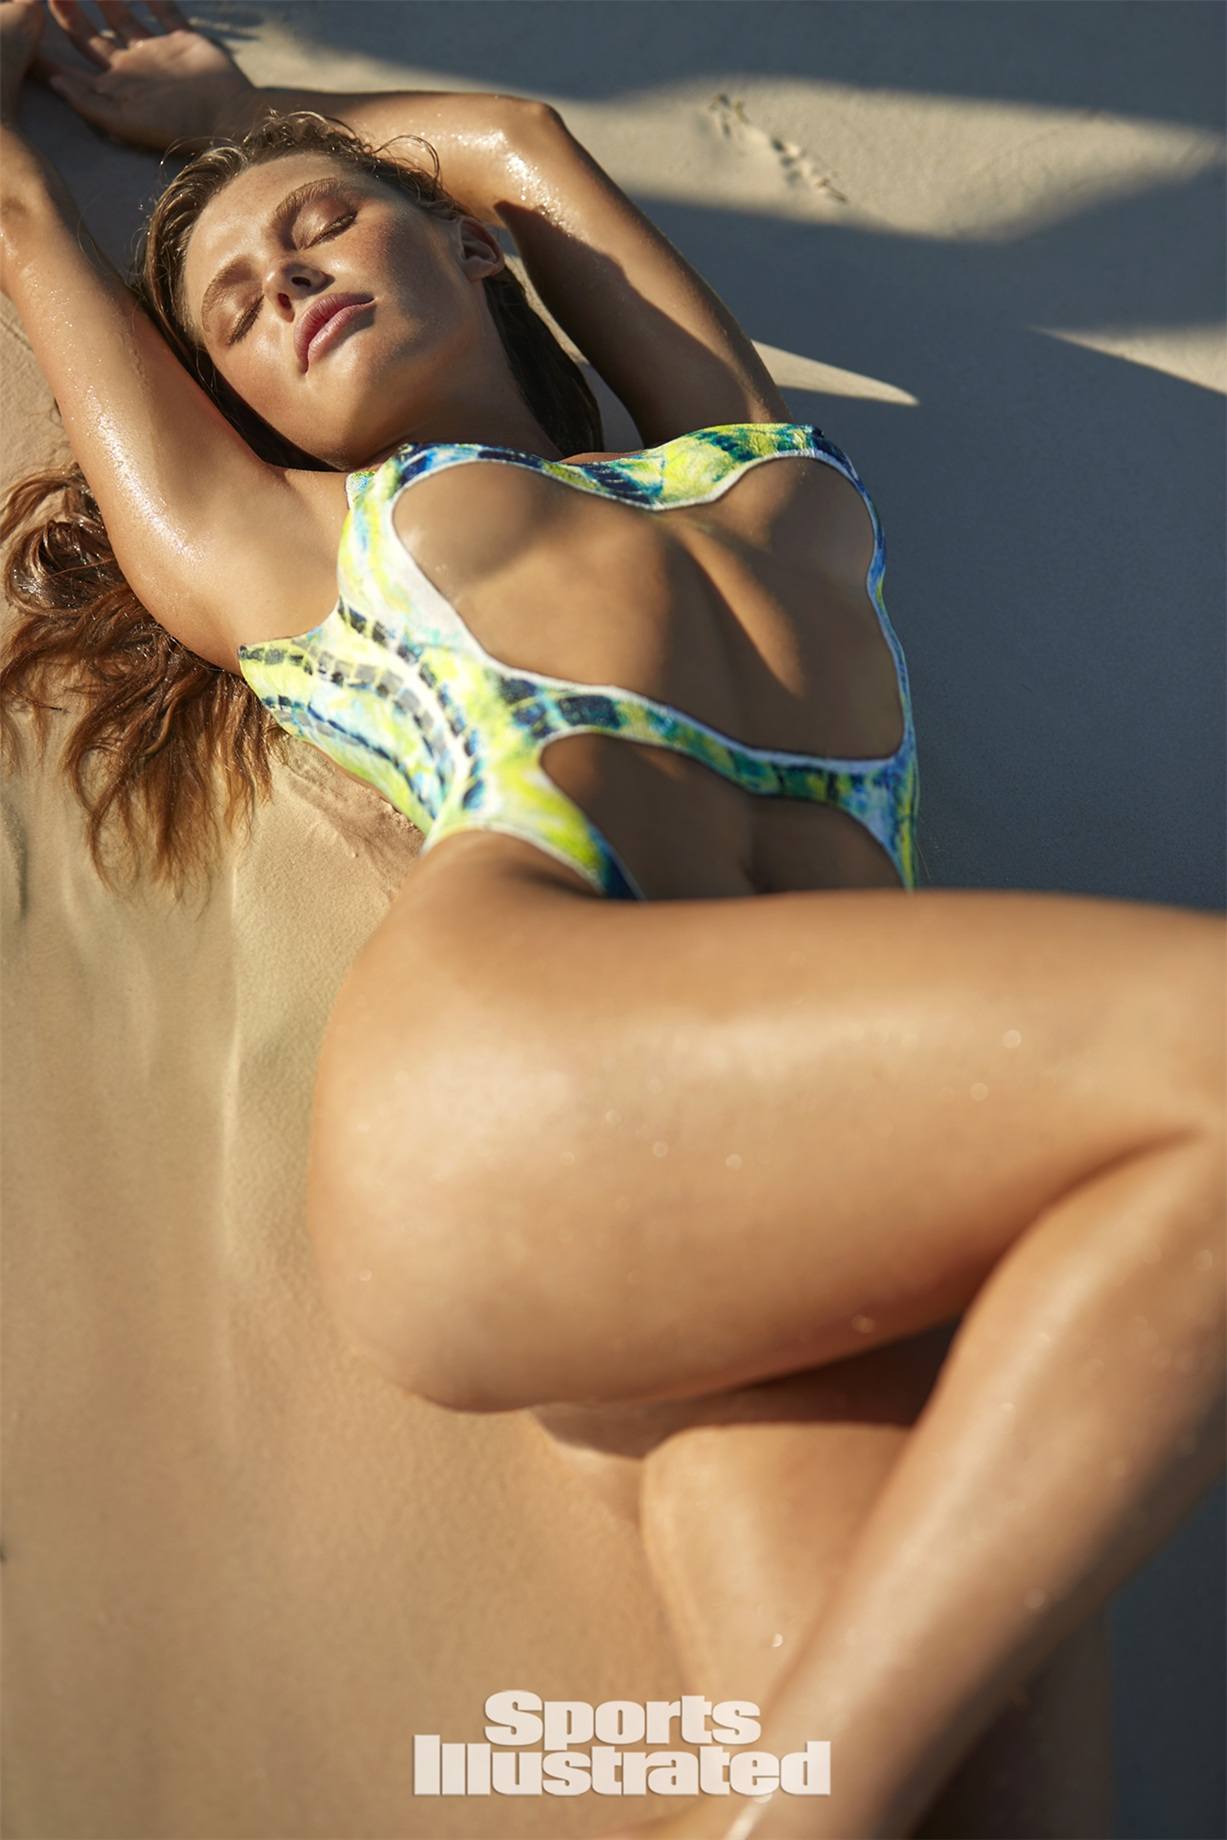 McKenna Berkley / МакКенна Беркли в боди-арт-купальнике - Sports Illustrated Swimsuit 2017 issue / in Anguilla by Josephine Clough